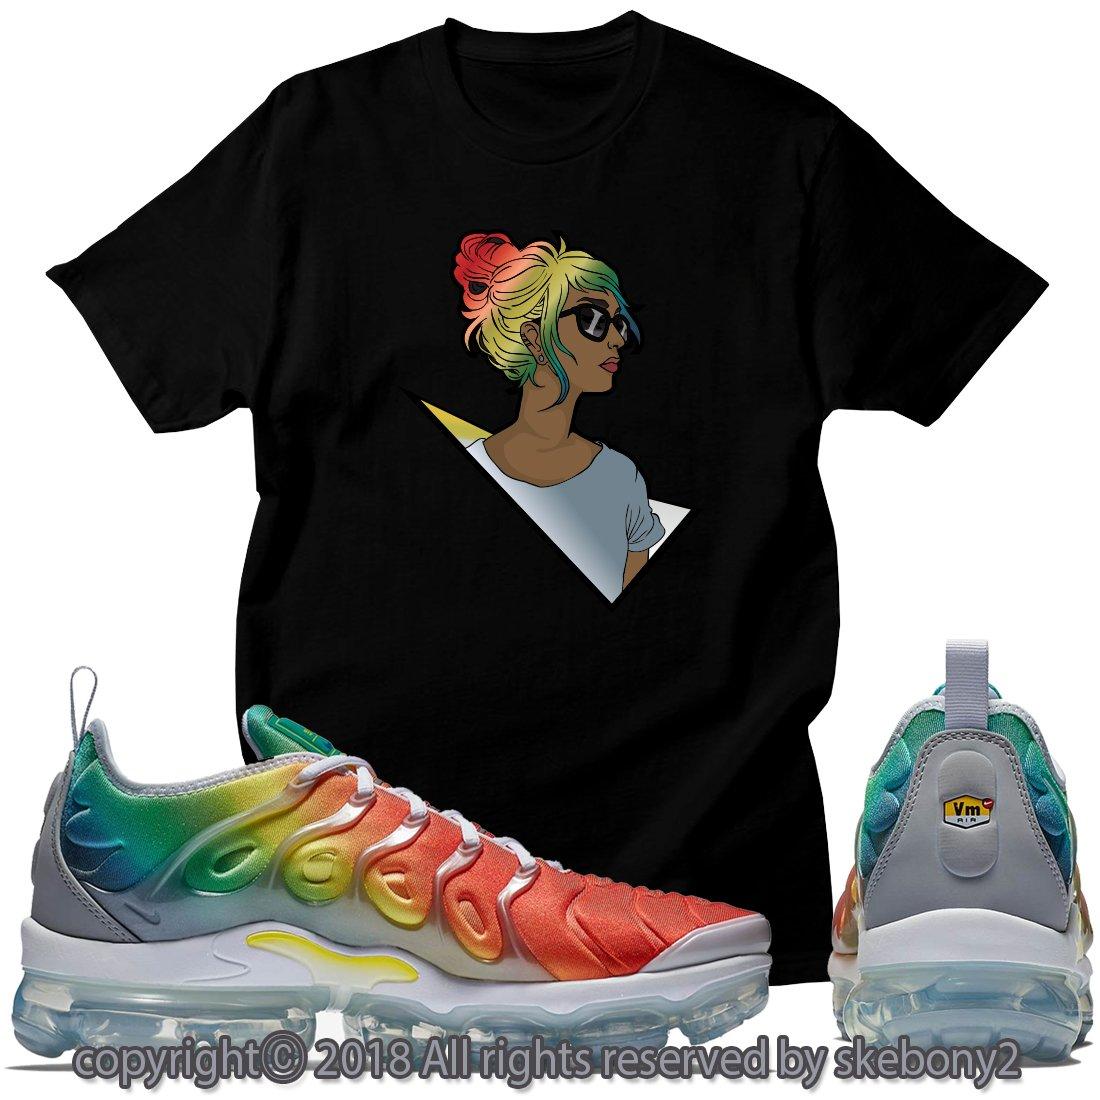 e380d0bc1d Custom T Shirt Matching Nike AIR Vapormax Plus Rainbow AVP 1-46-2 at Amazon  Men's Clothing store: